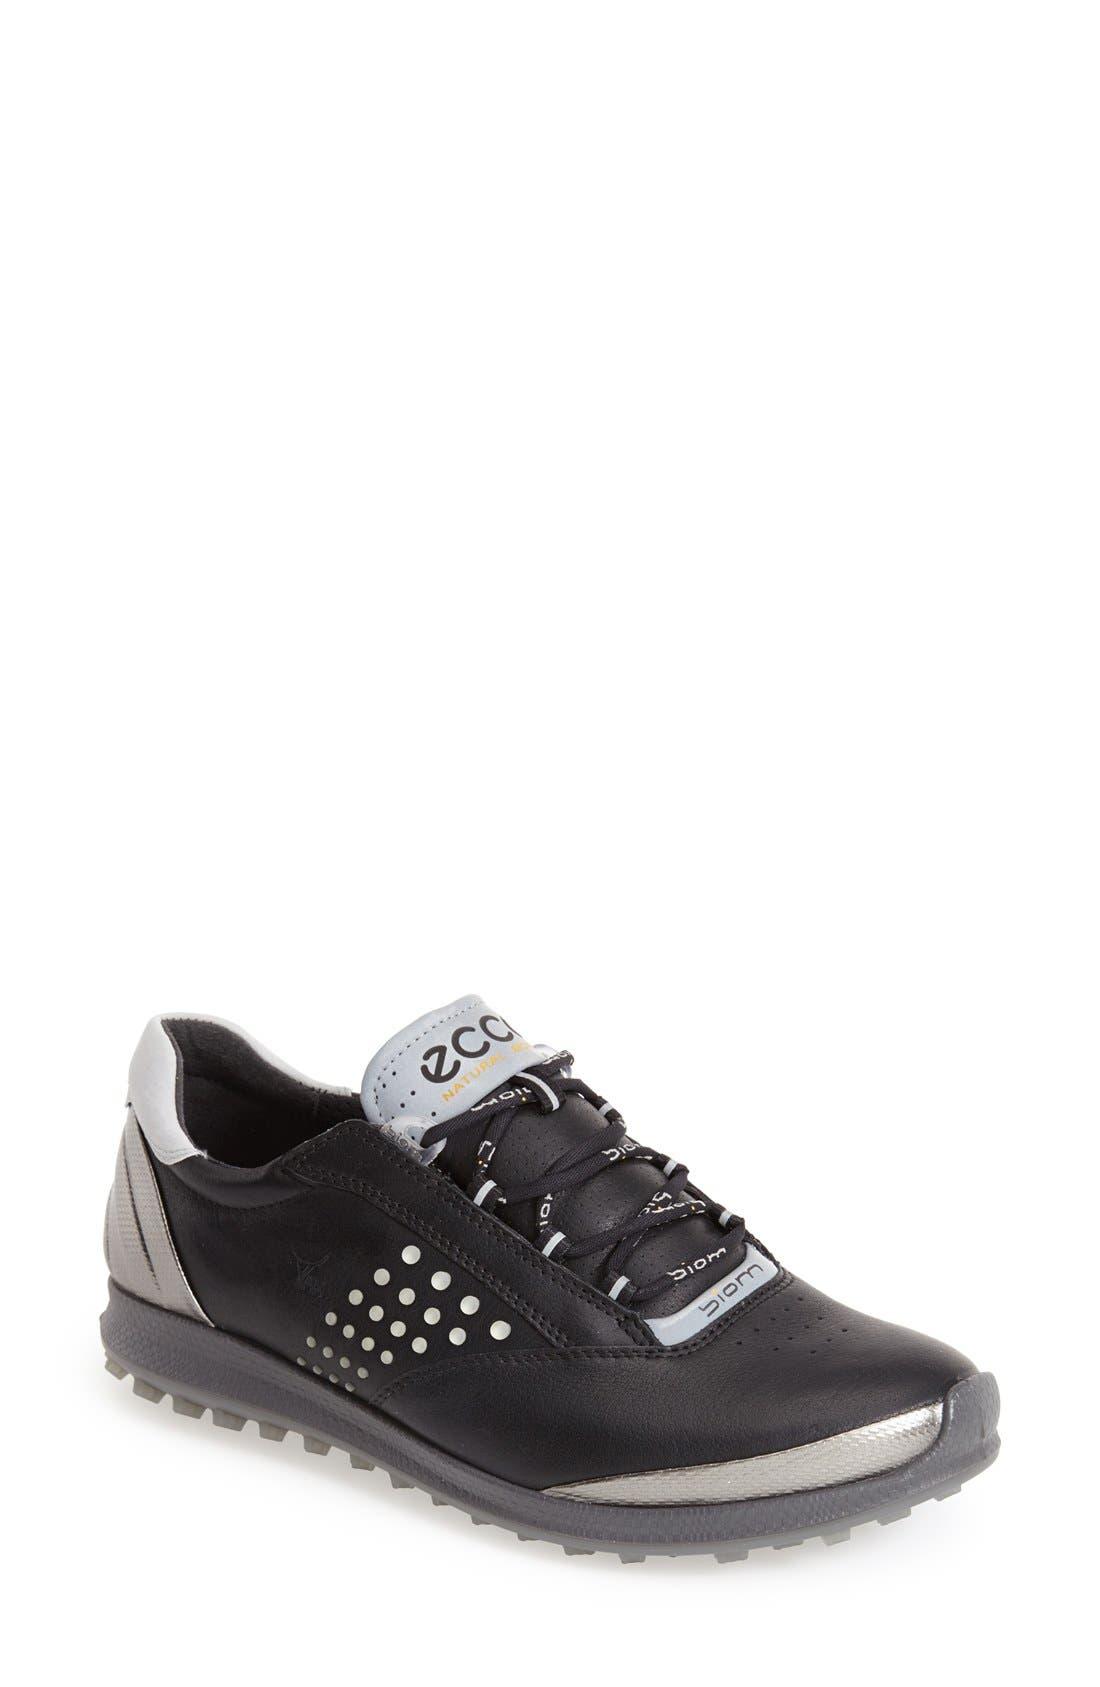 ecco waterproof shoes womens